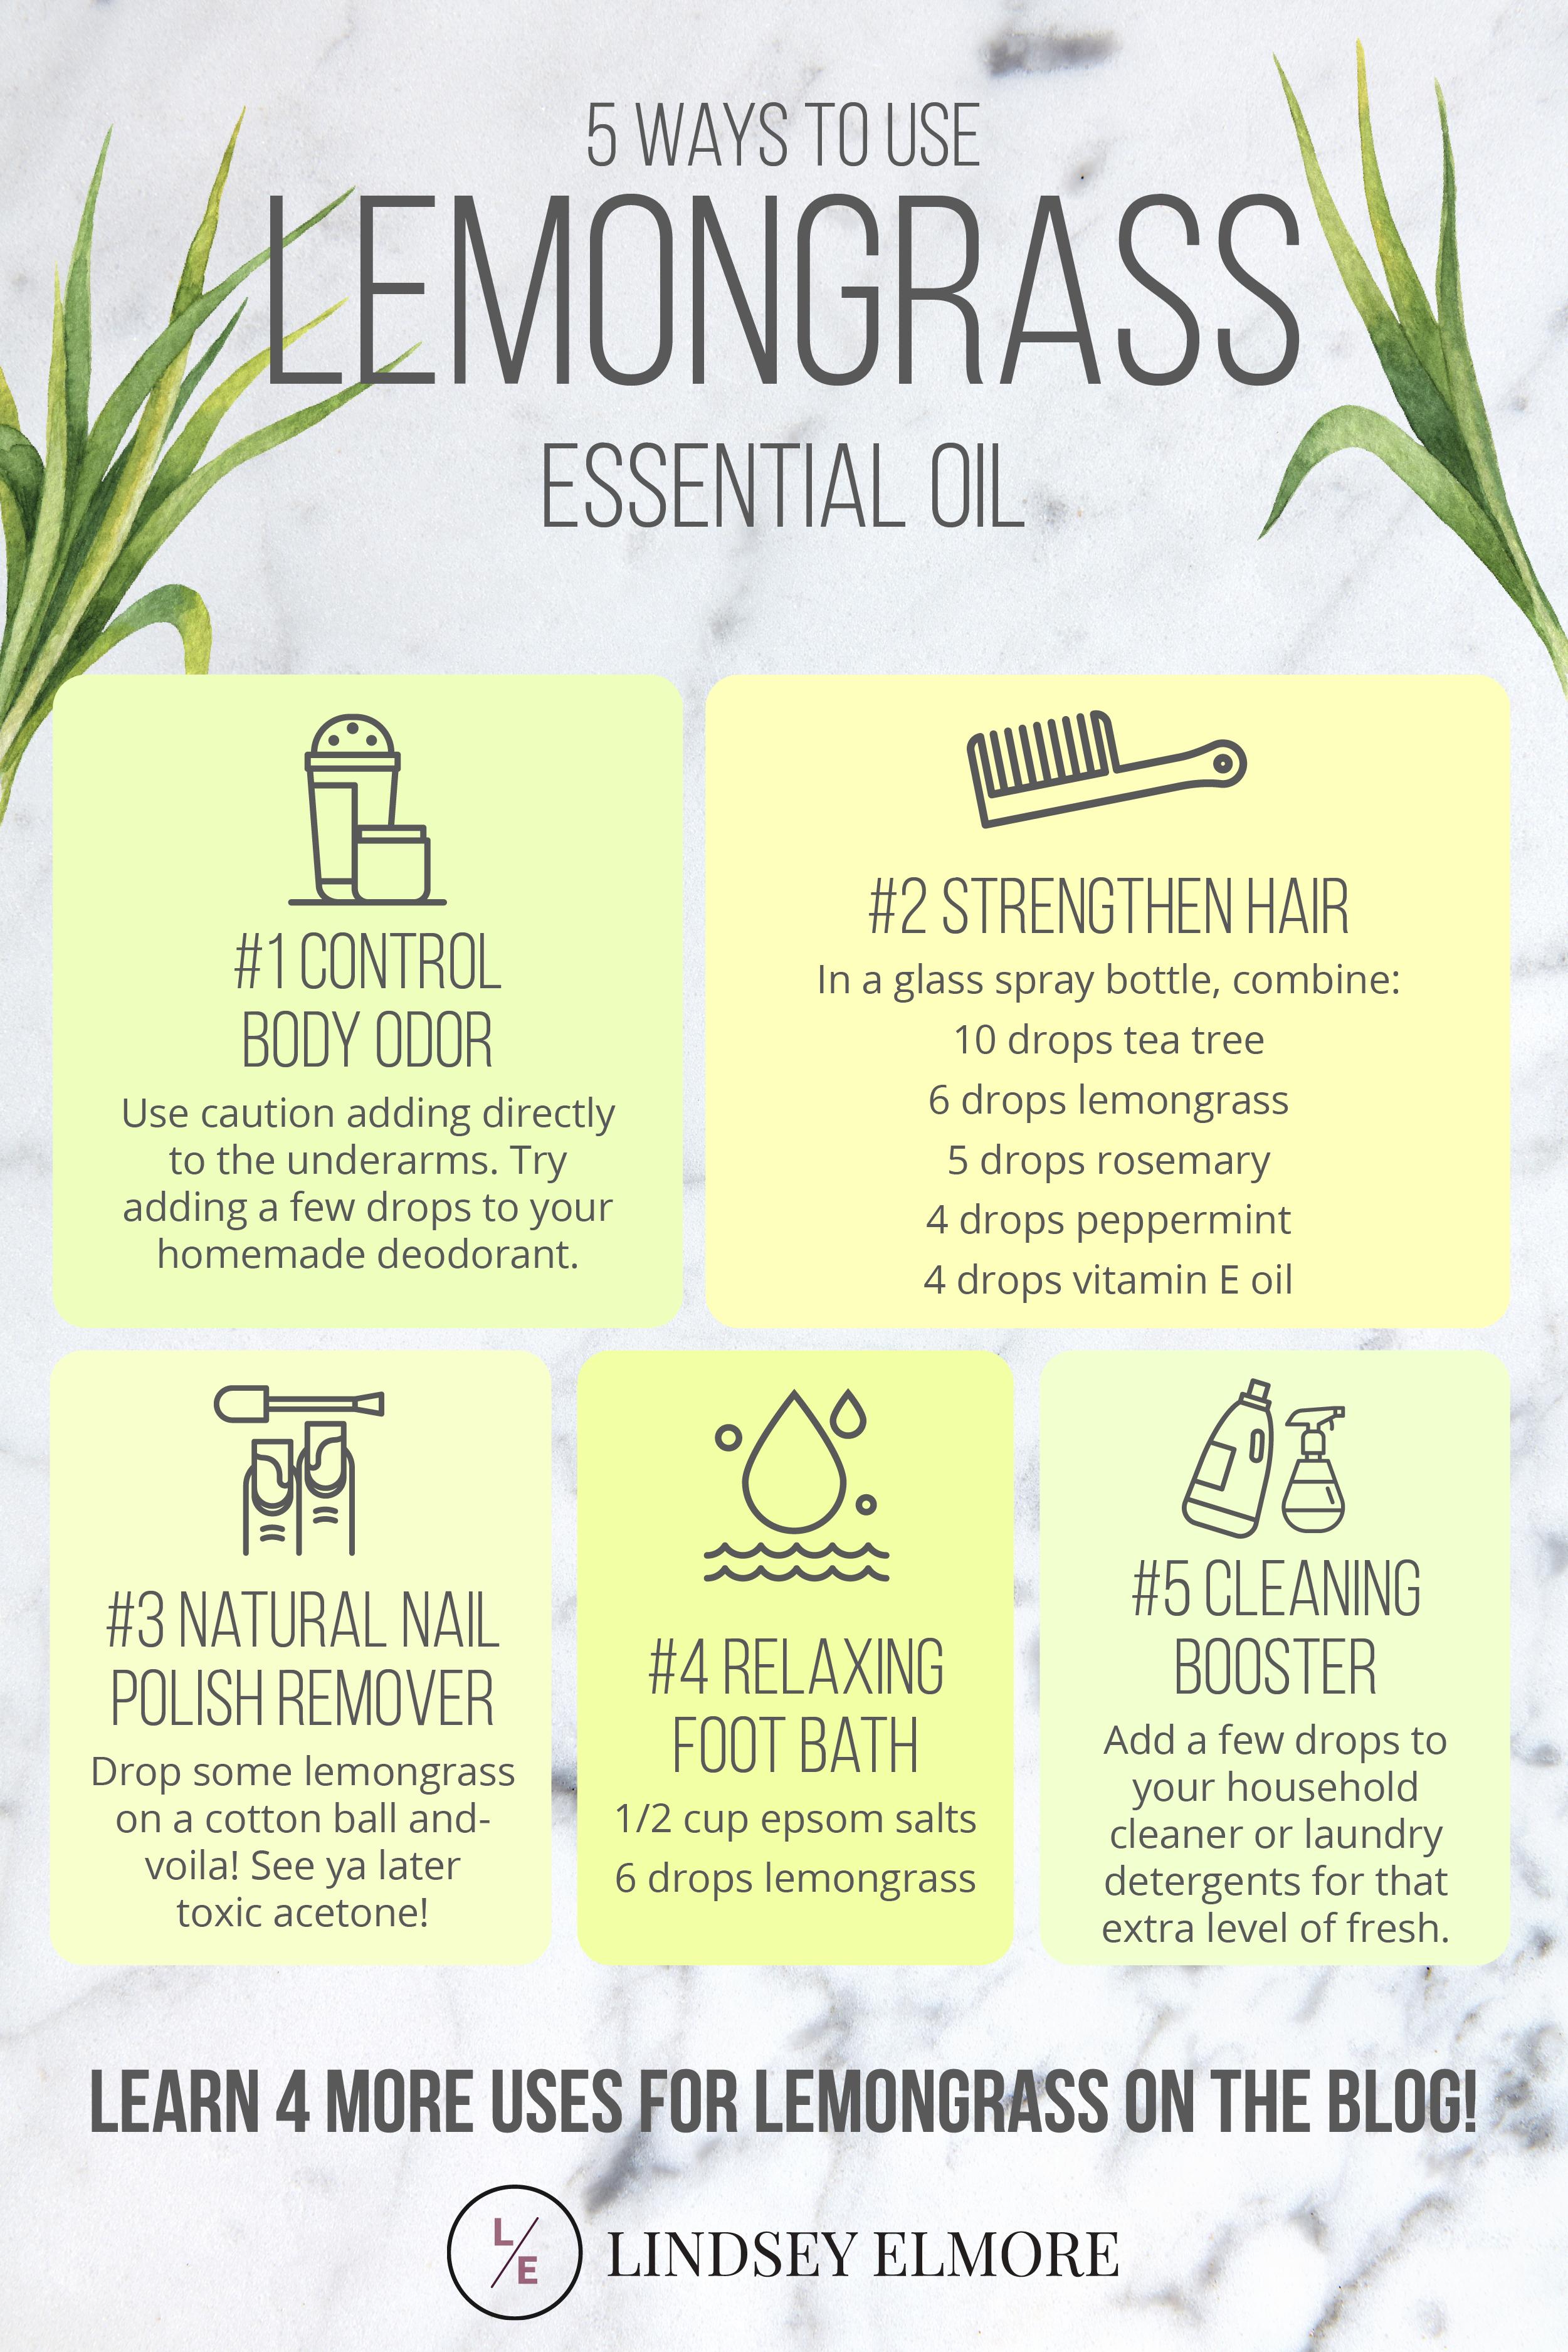 9 Ways To Use Lemongrass Essential Oil Lindsey Elmore Lemongrass Essential Oil Essential Oils Essential Oils Aromatherapy